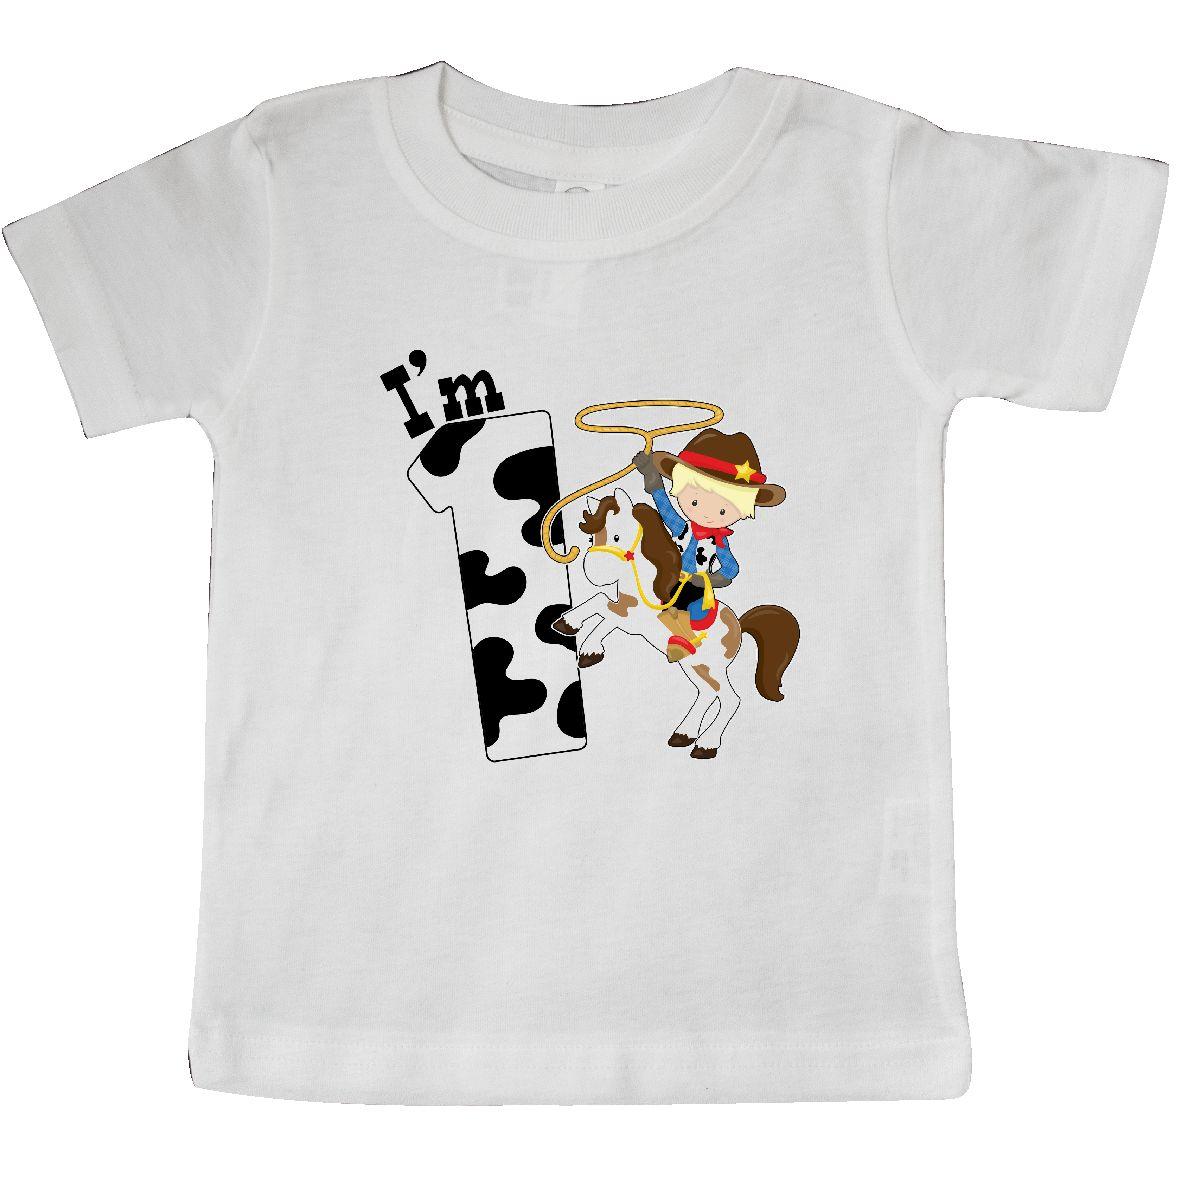 22fb9130 inktastic Inktastic I'm One-cowboy Riding Horse Birthday Baby T-Shirt  Birthdays First 1st